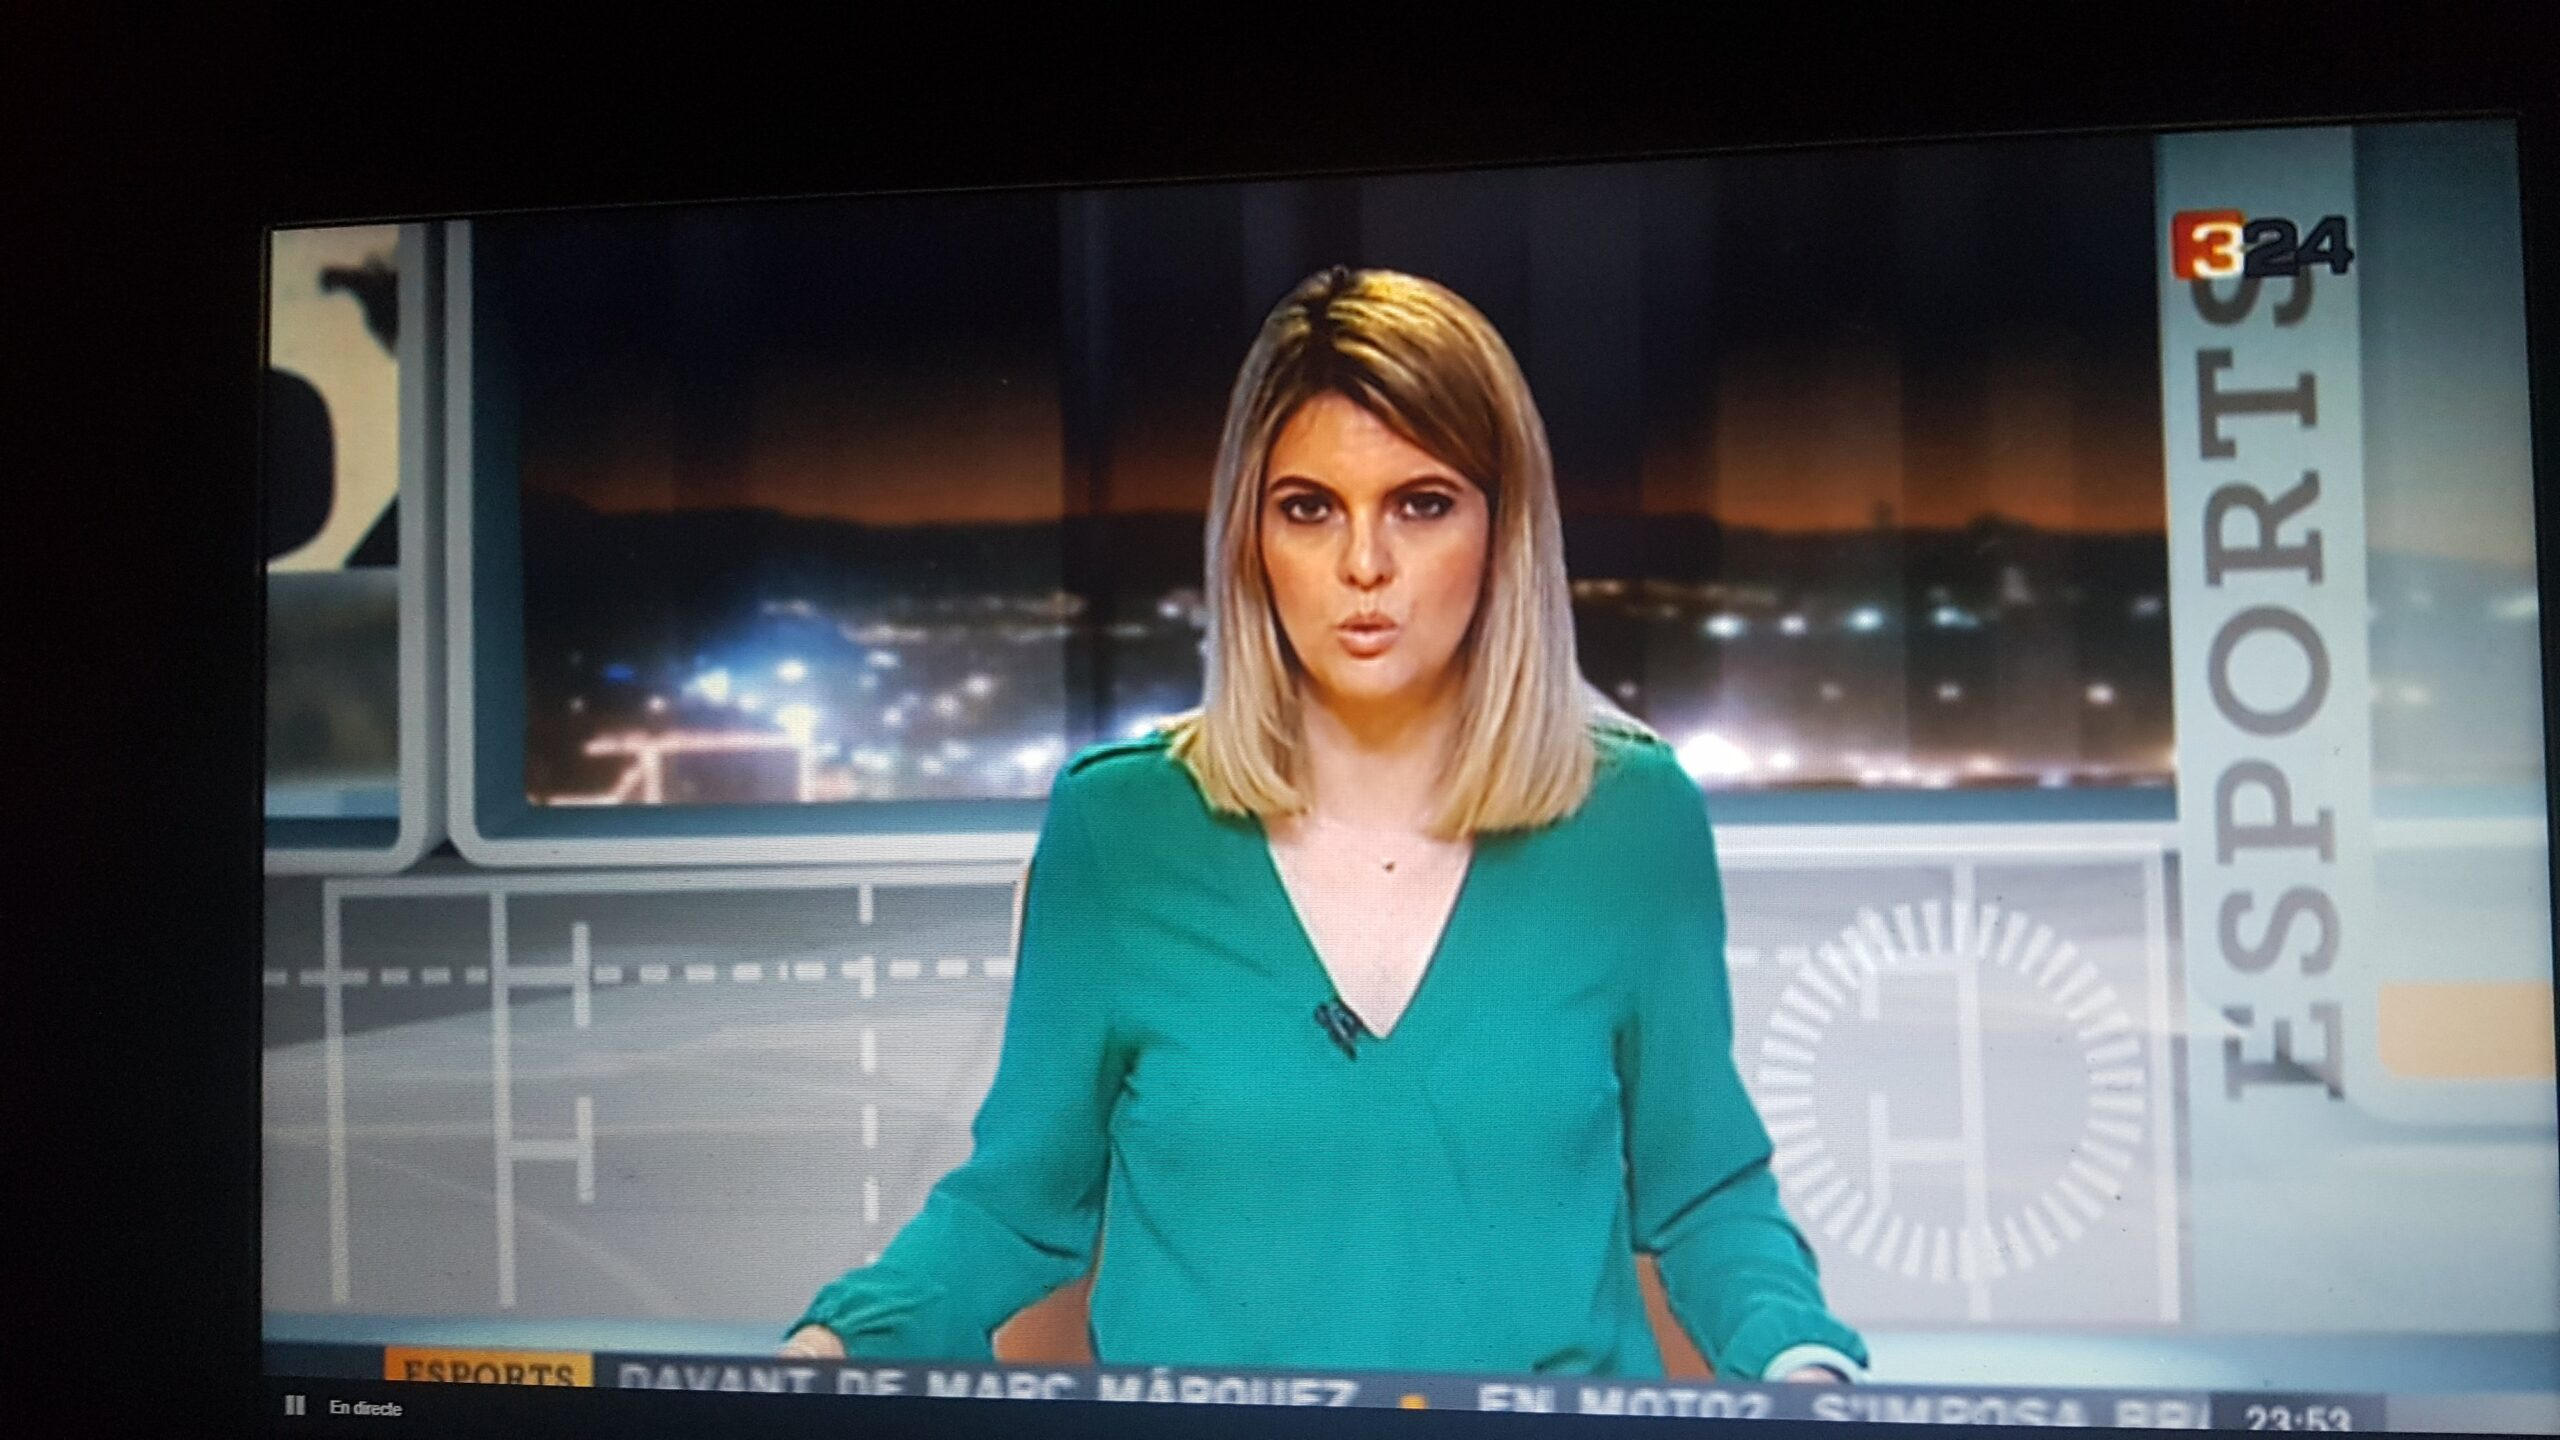 Ruth Gumbau sustituye a Xevi Bardolet en el canal 3/24